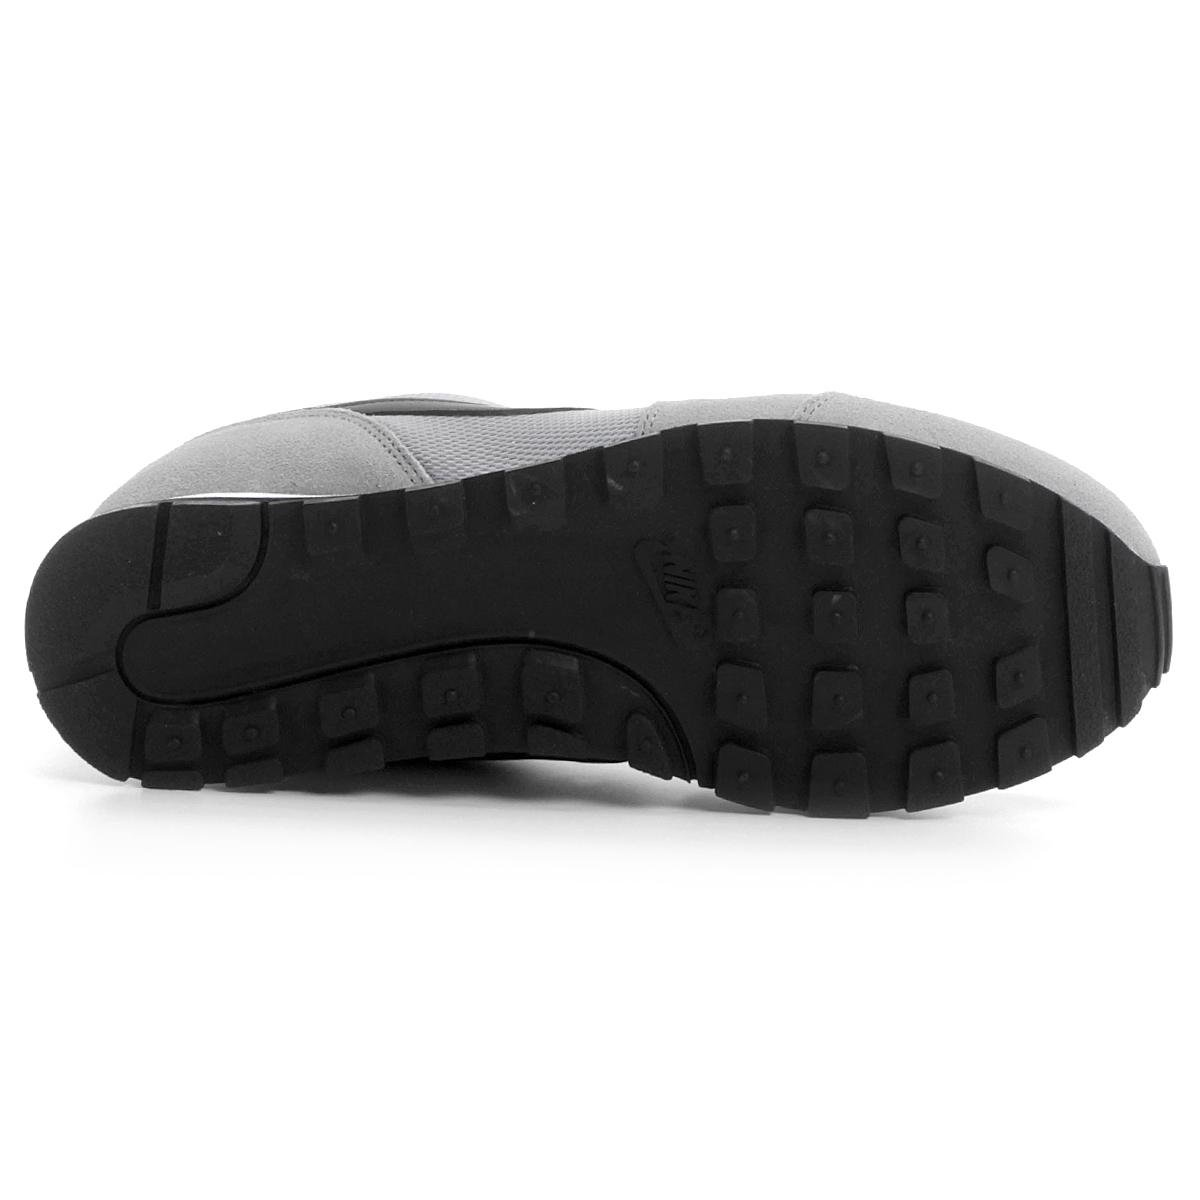 Tênis Nike Md Runner 2 Masculino - Tam: 44 - 1